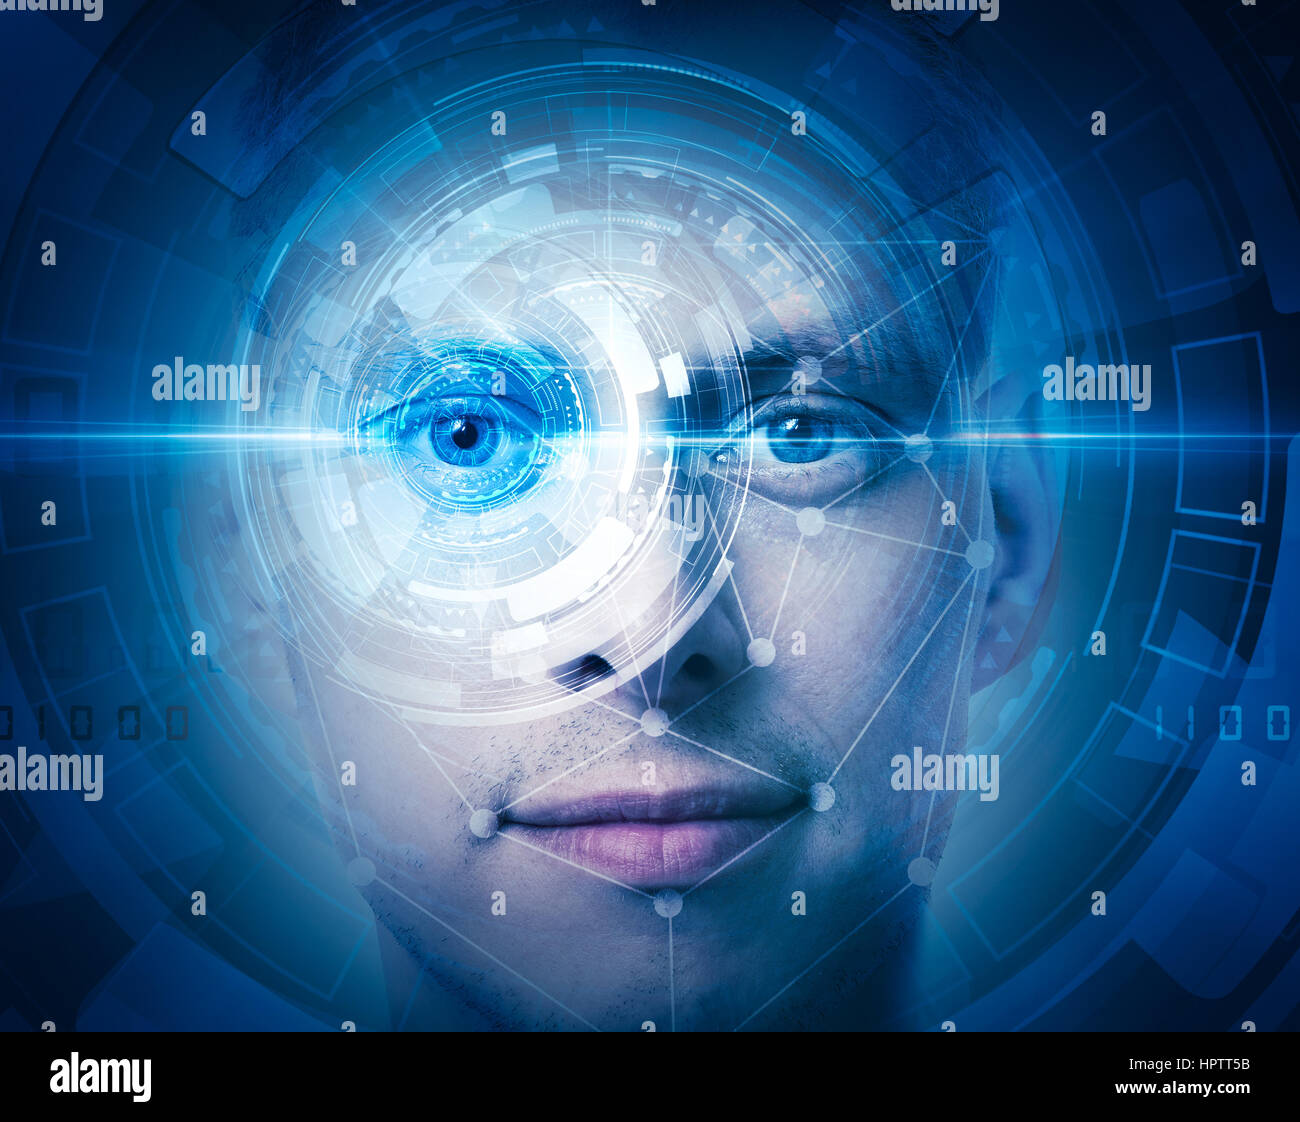 Alta tecnología de captura facial Imagen De Stock